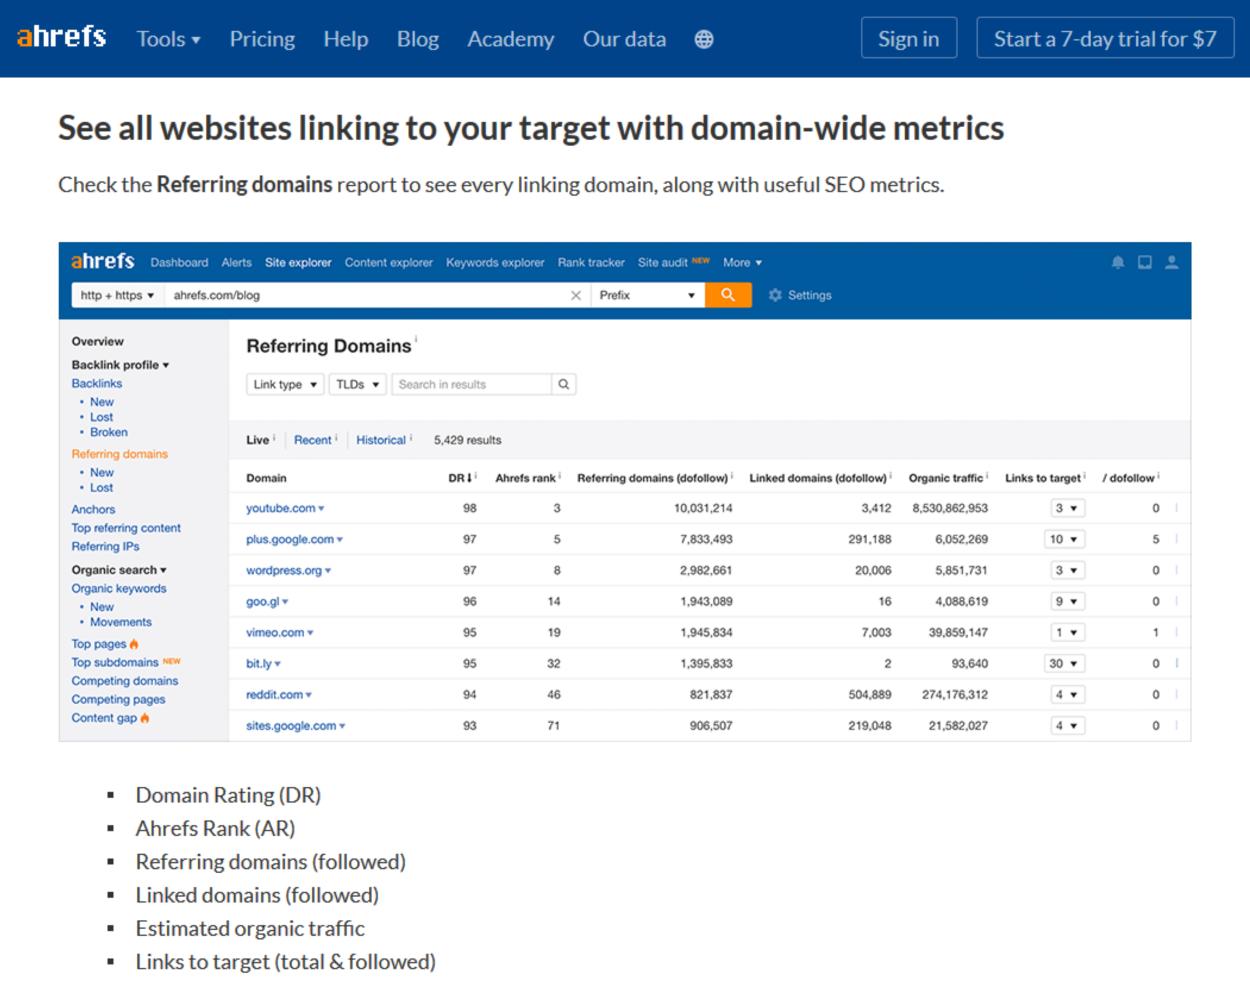 Ahrefs - Website Linking Metrics - Part 1